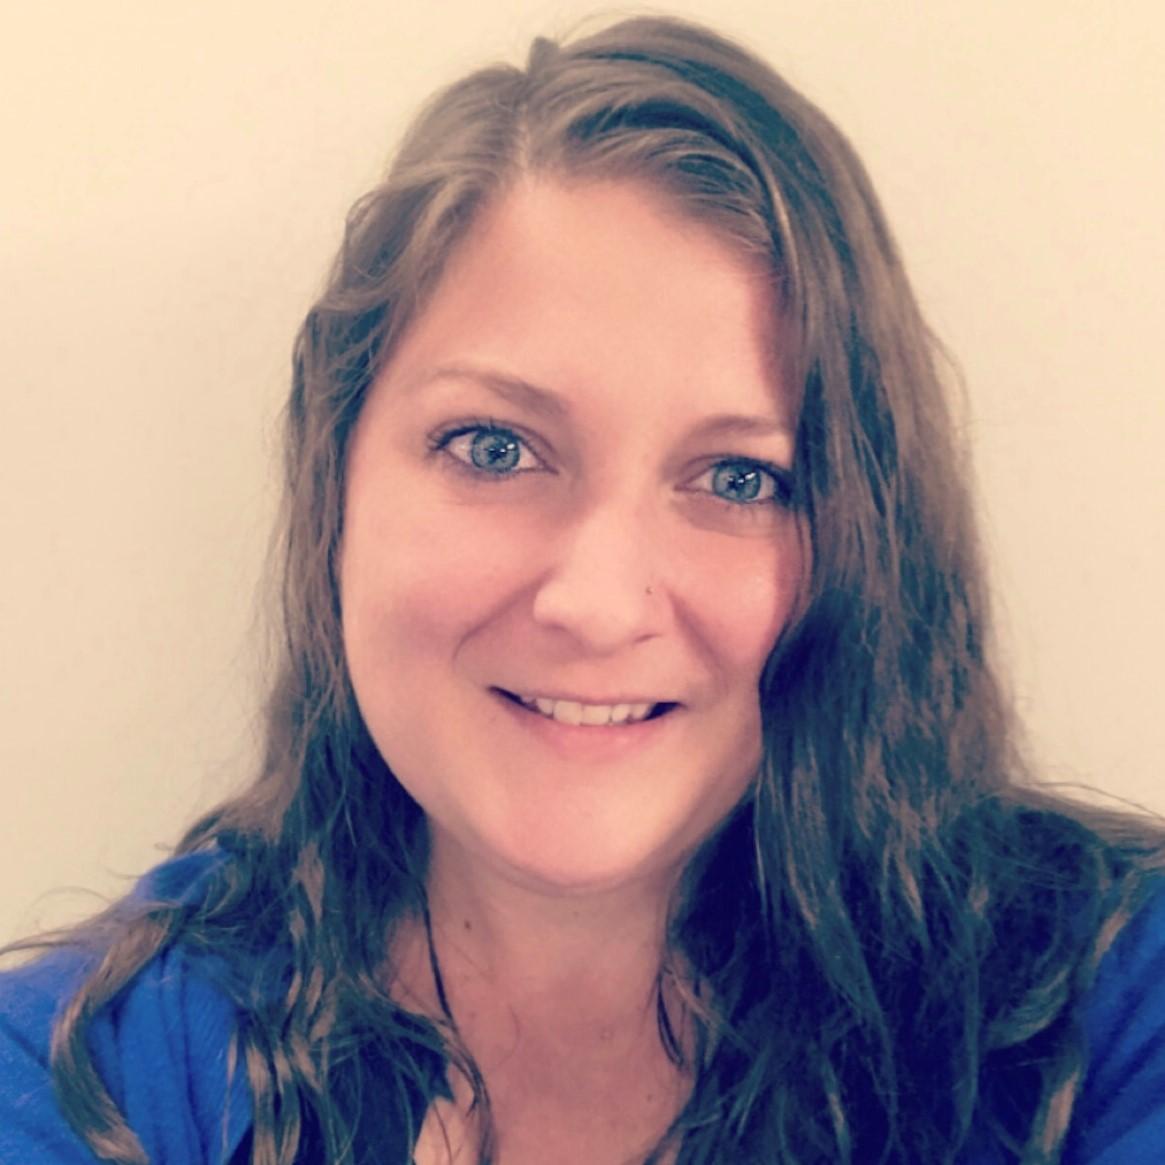 Service Coordinator / AAC Specialist - Liza Jones: - lizaj@gmssi.org (ext: 236)